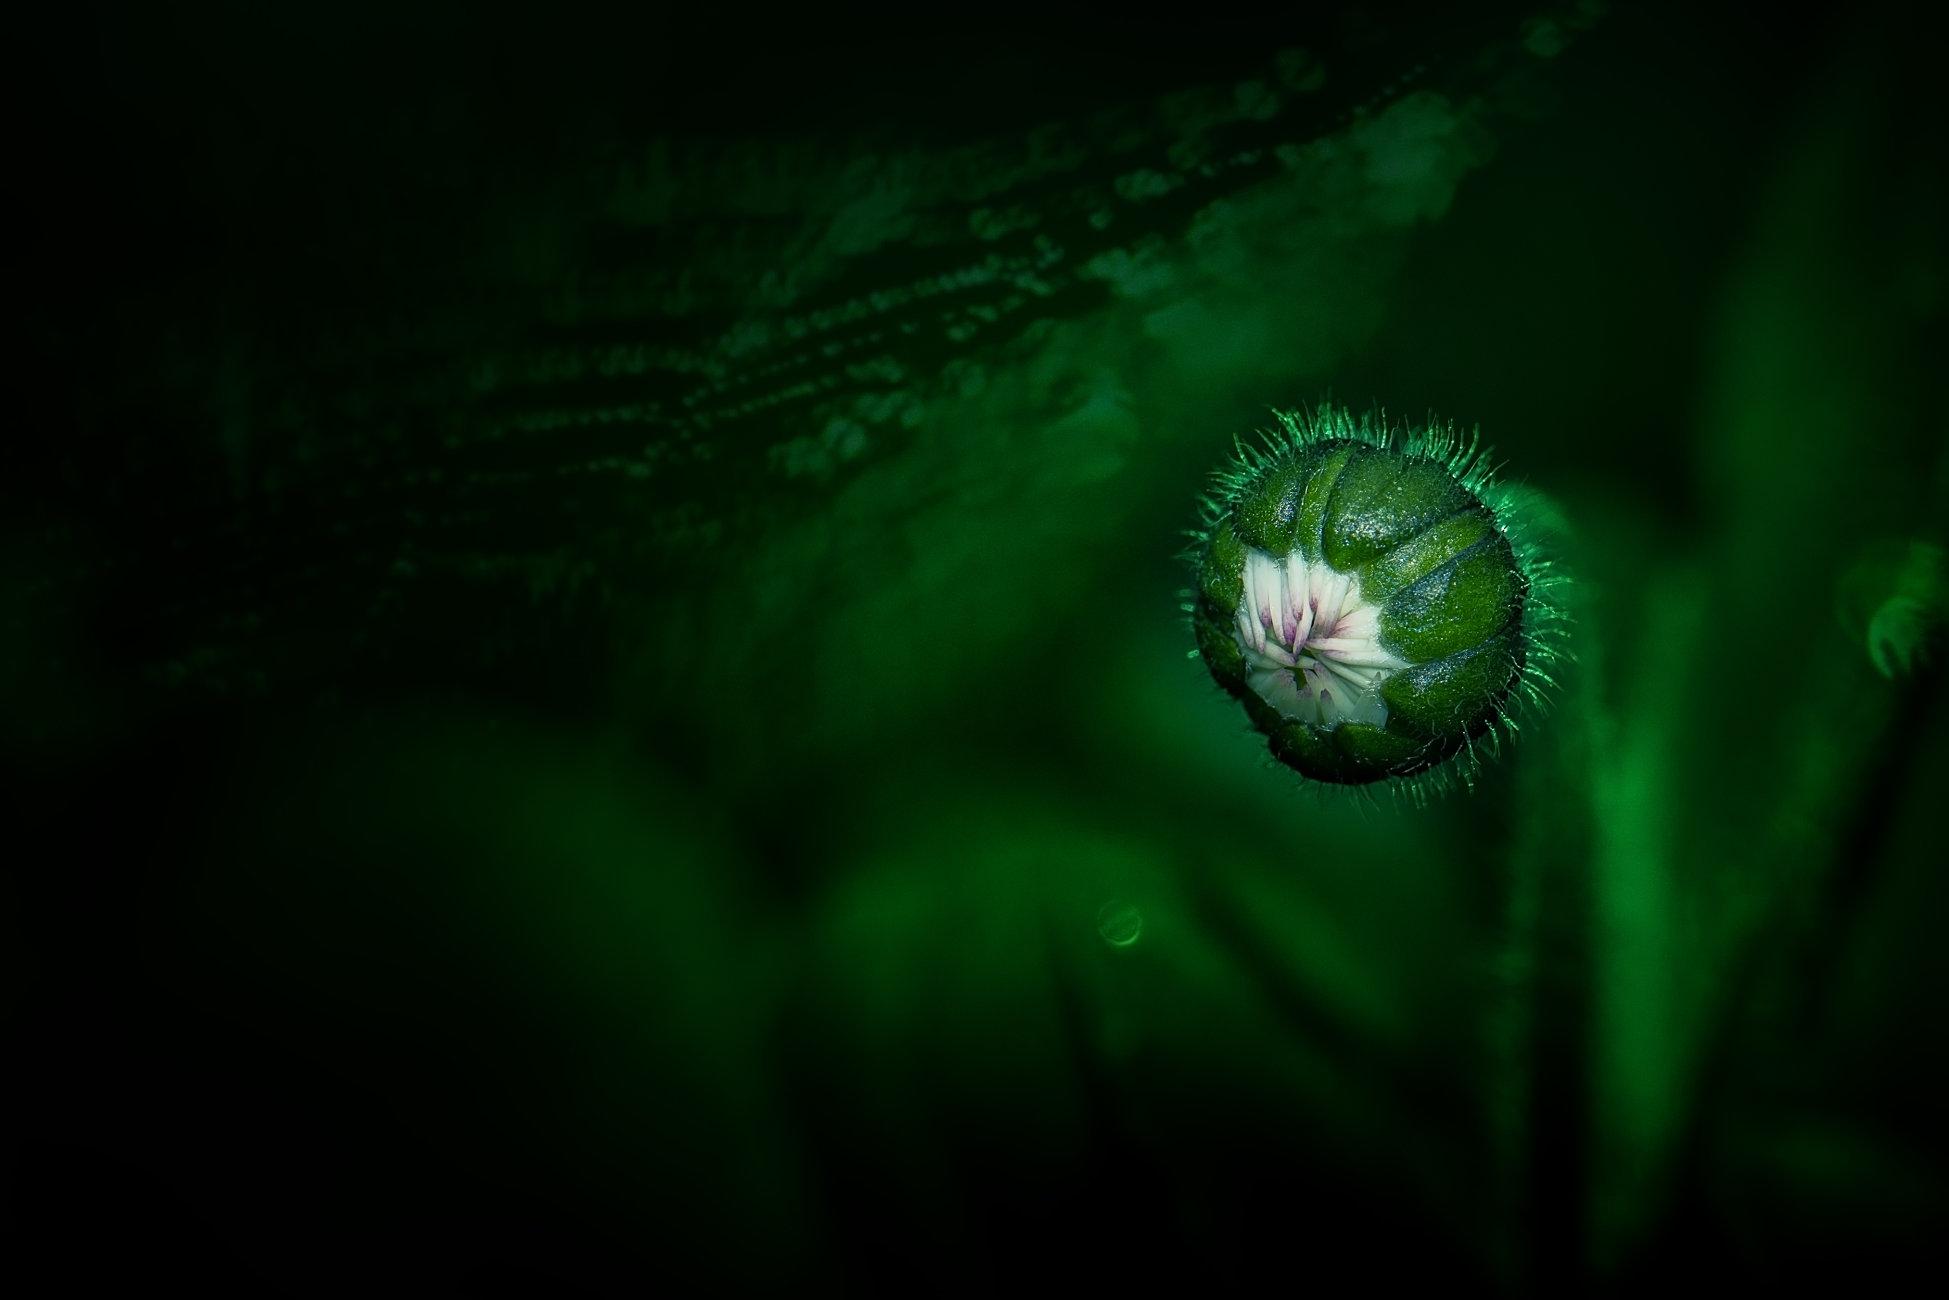 Daisy flower bud